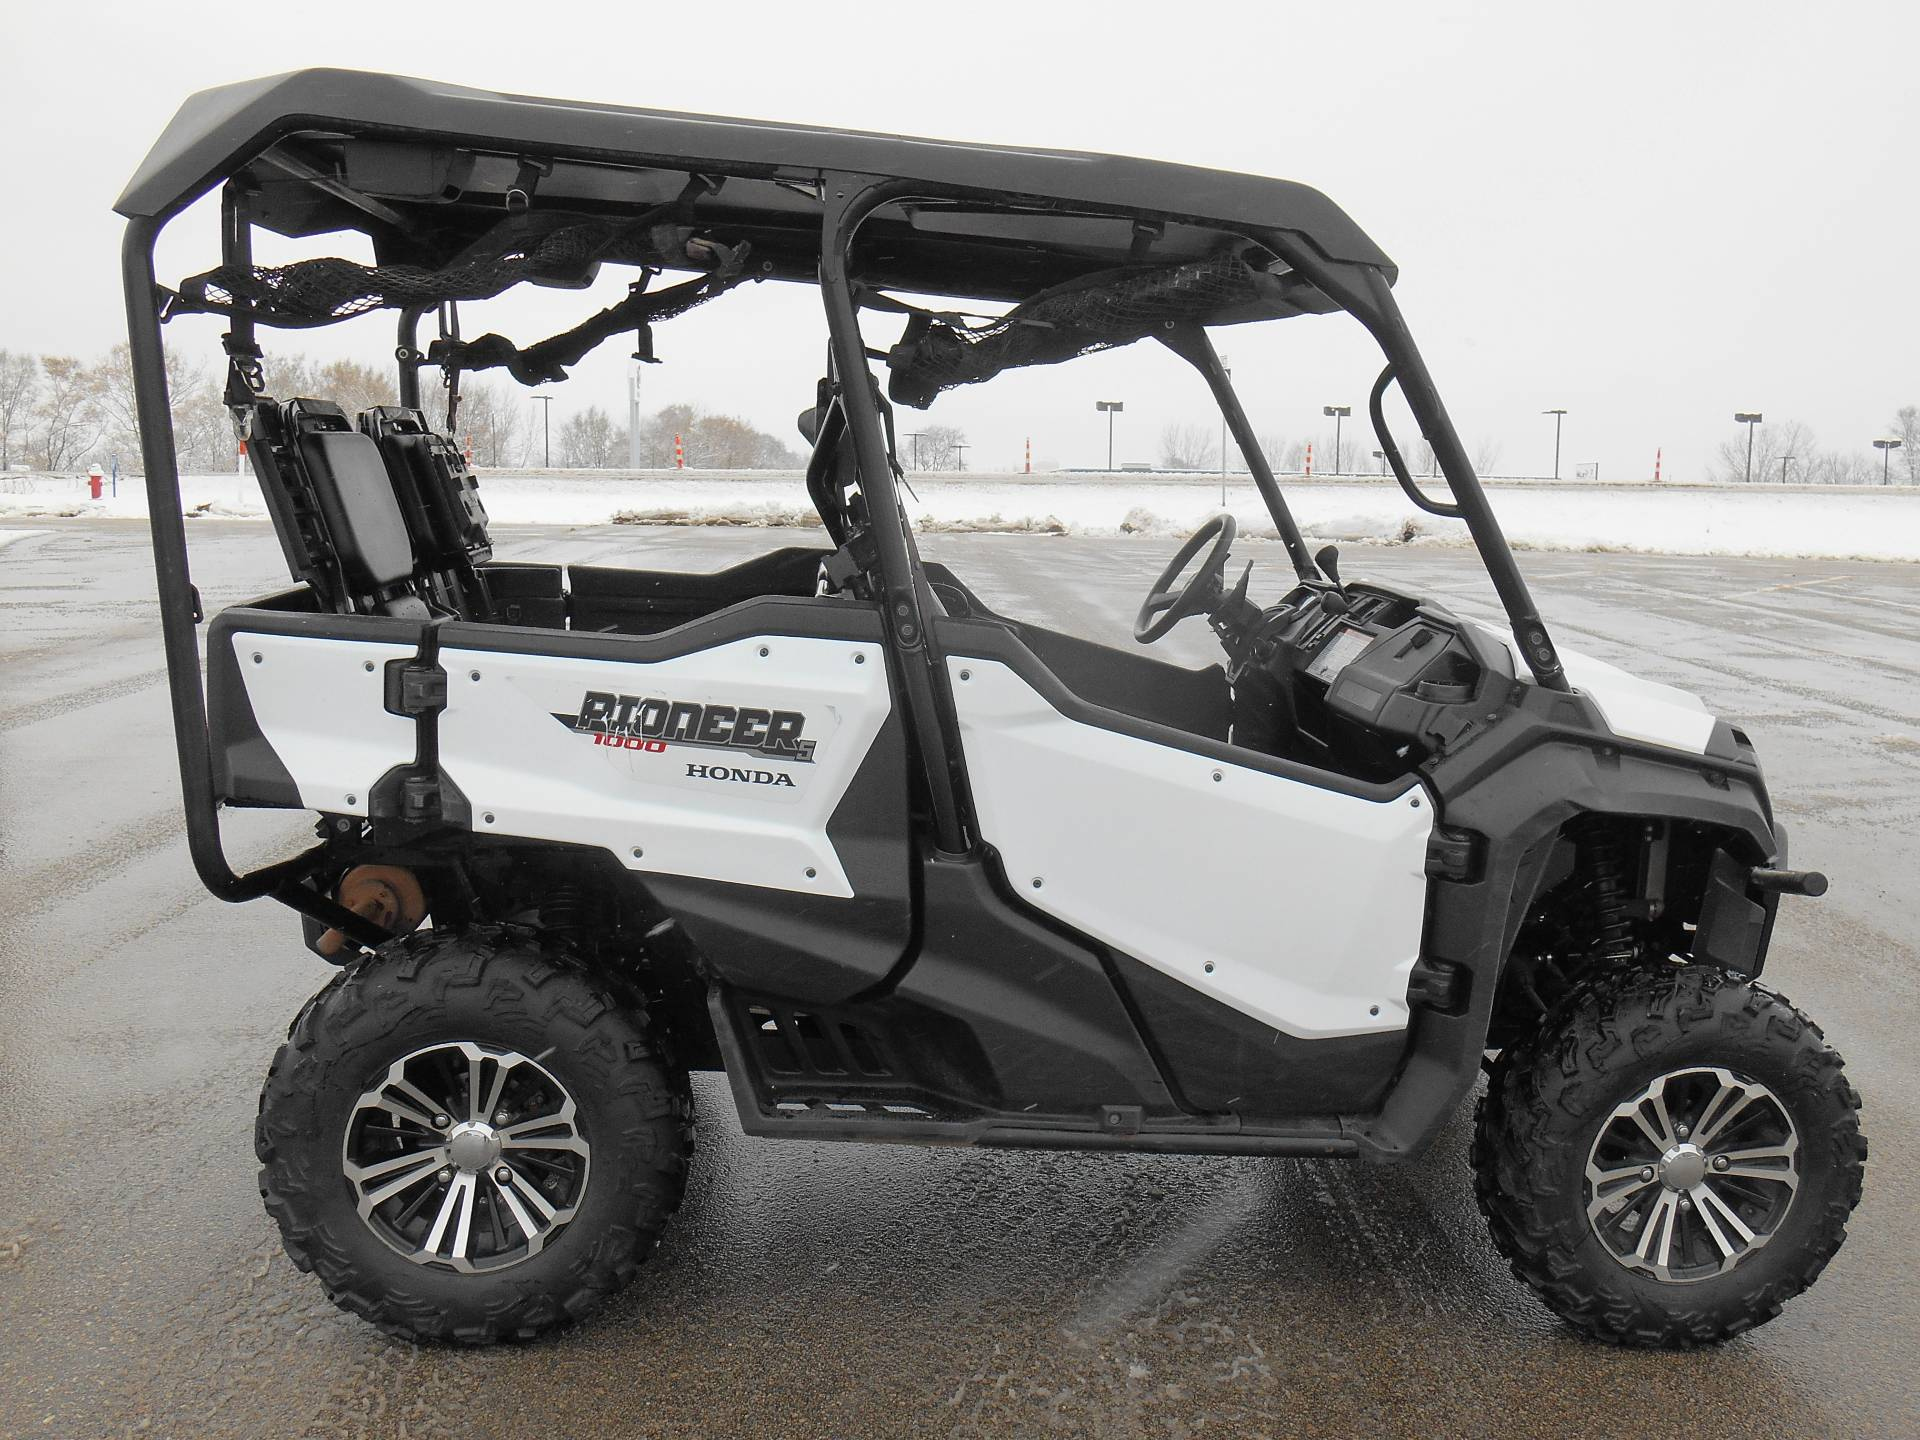 2016 Honda Pioneer 1000 5 Deluxe In Dubuque Iowa